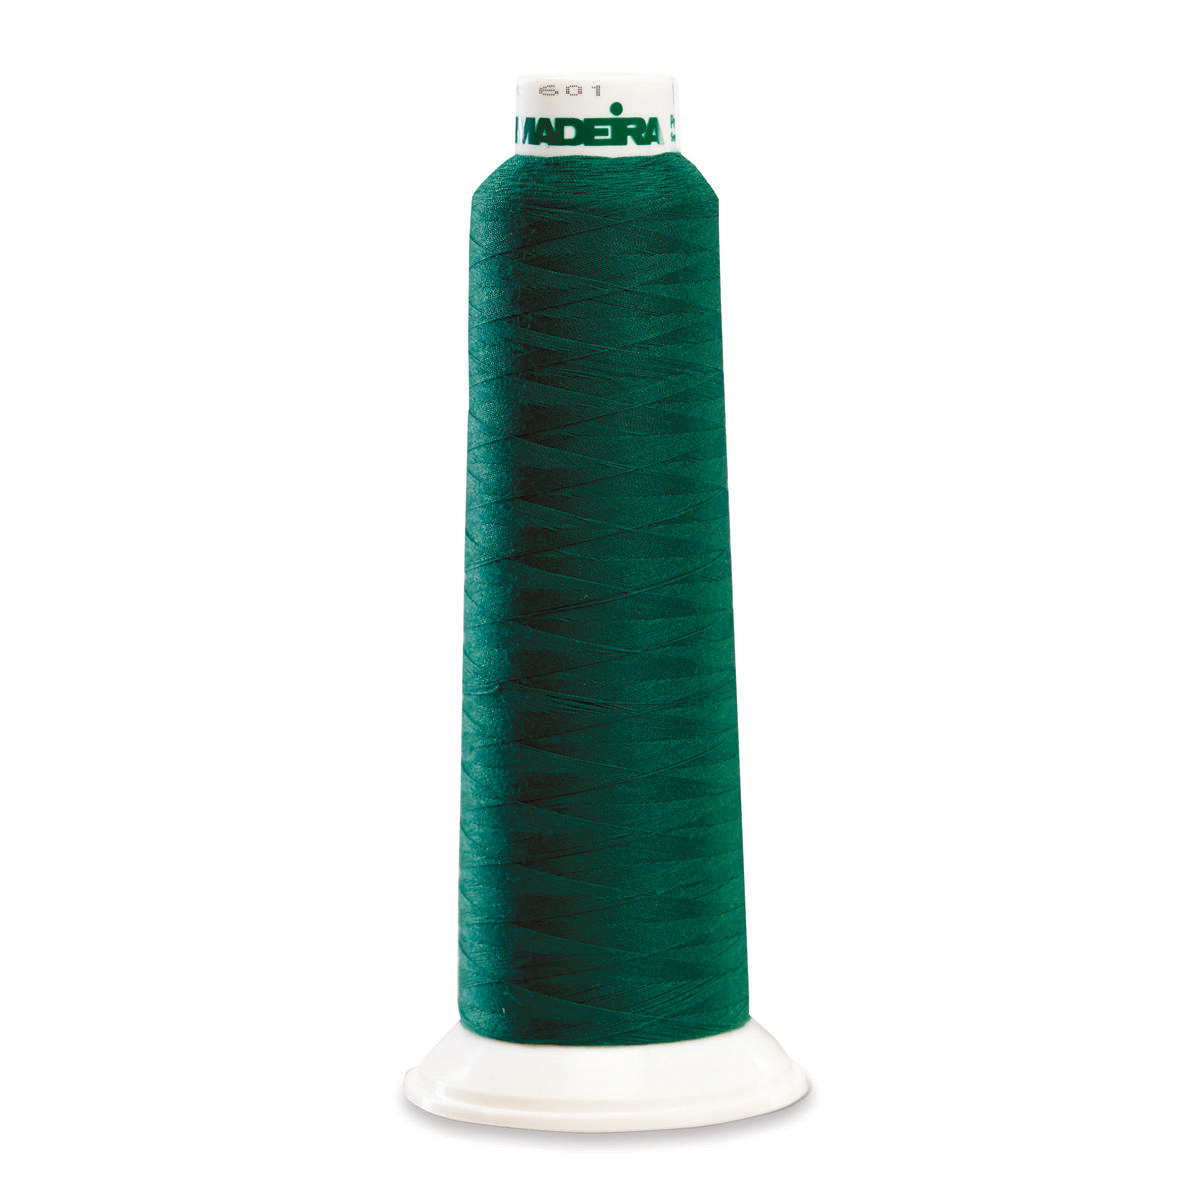 9902 Pine Green Poly Serger Thread Madeira Aerolock